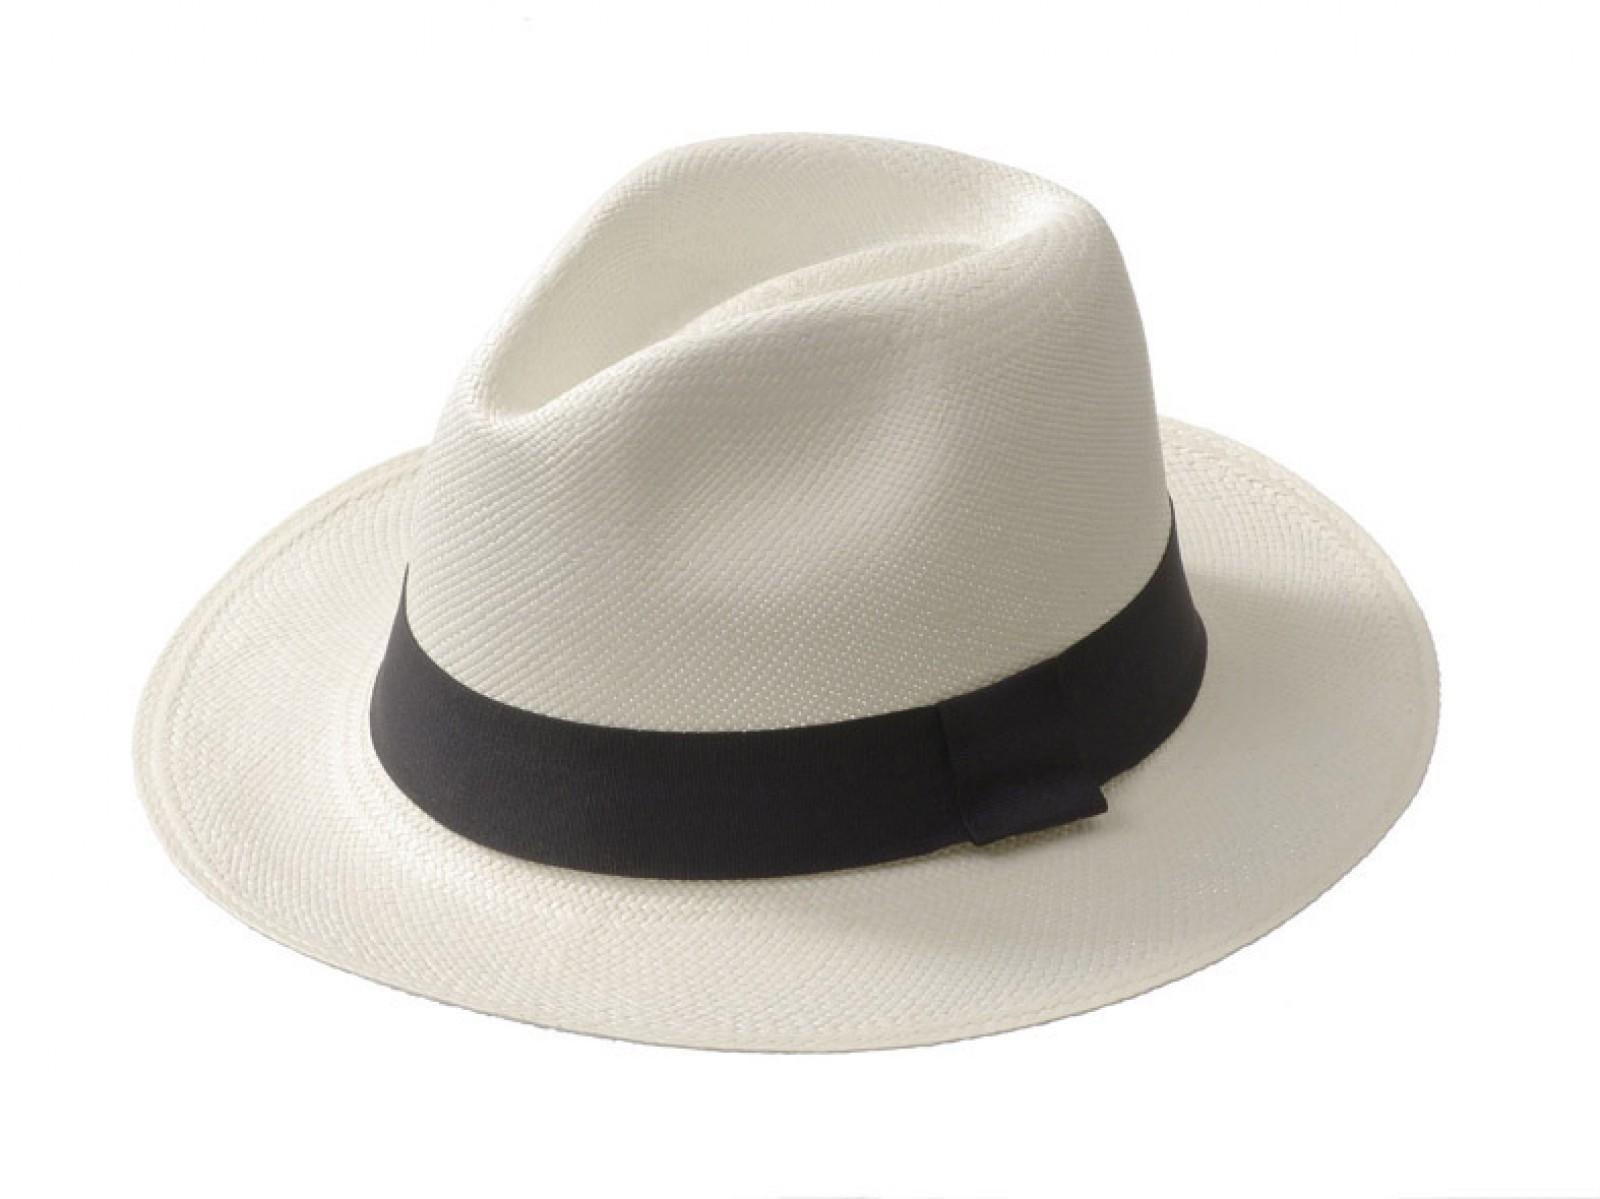 0e1a7f0f64aac Sombrero Sombrero Panamá - Classic Blanco - Marca De Punta En Blanco